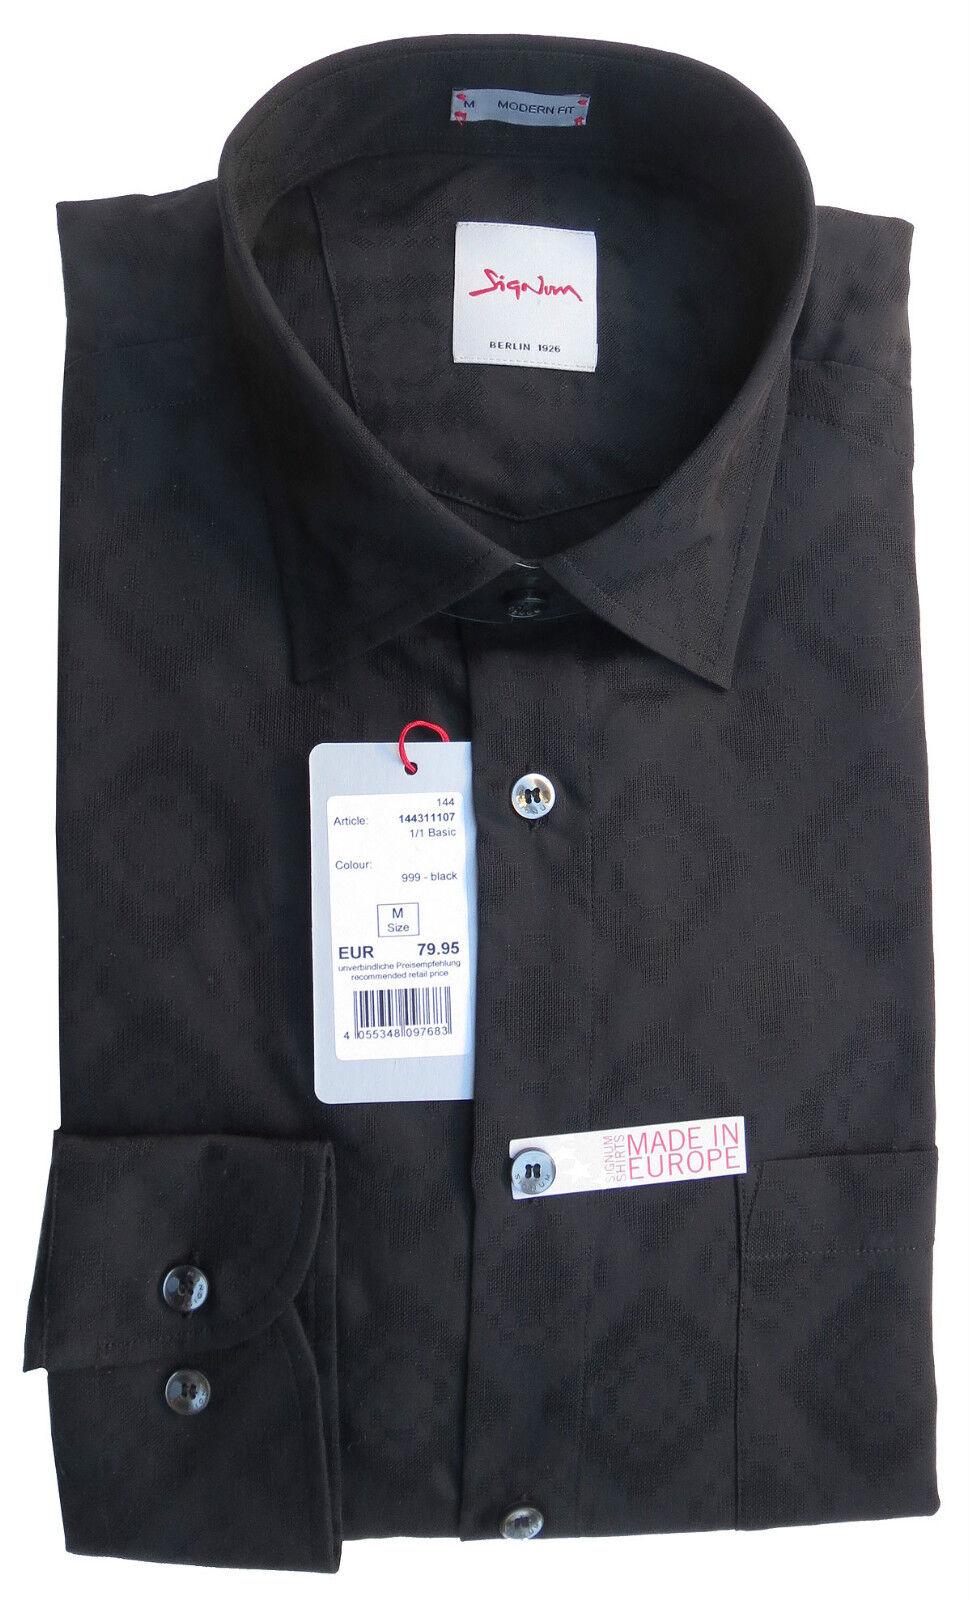 SIGNUM Camicia Manica Lunga Modern Fit Nuovo Nuovo Nuovo Taglia L jaquardwebung s1.1003 86b99b